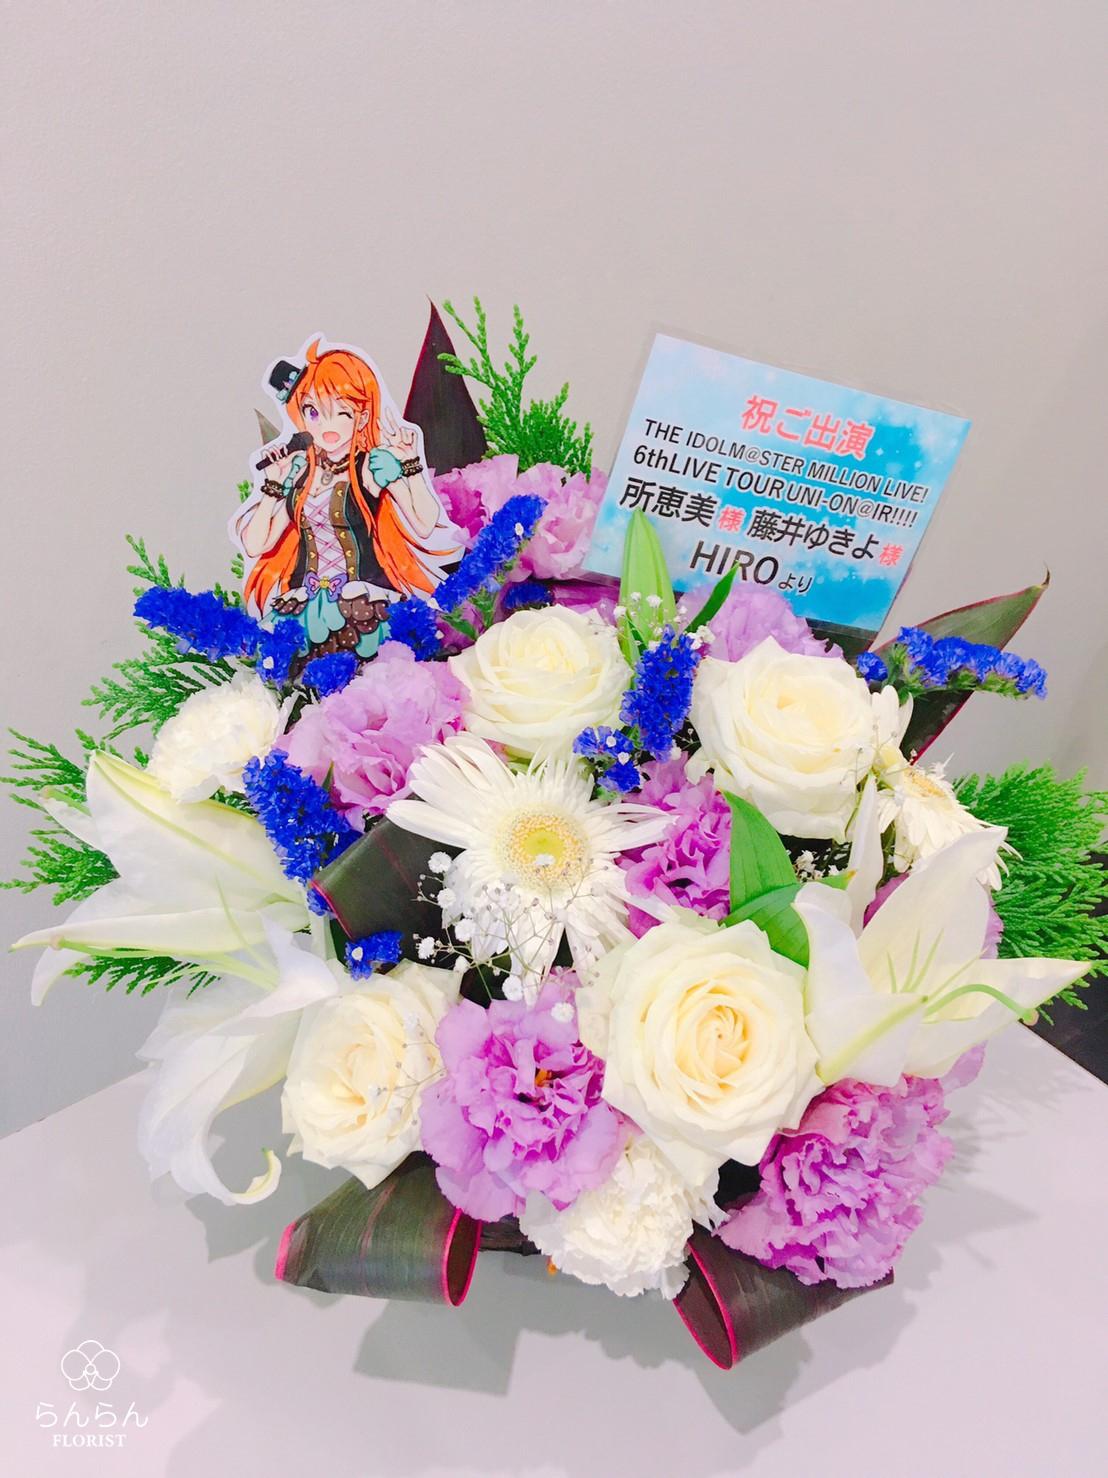 THE IDOLM@STER MILLION LIVE! 6thLIVE TOUR UNI-ON@IR!!!!ご出演者 楽屋花